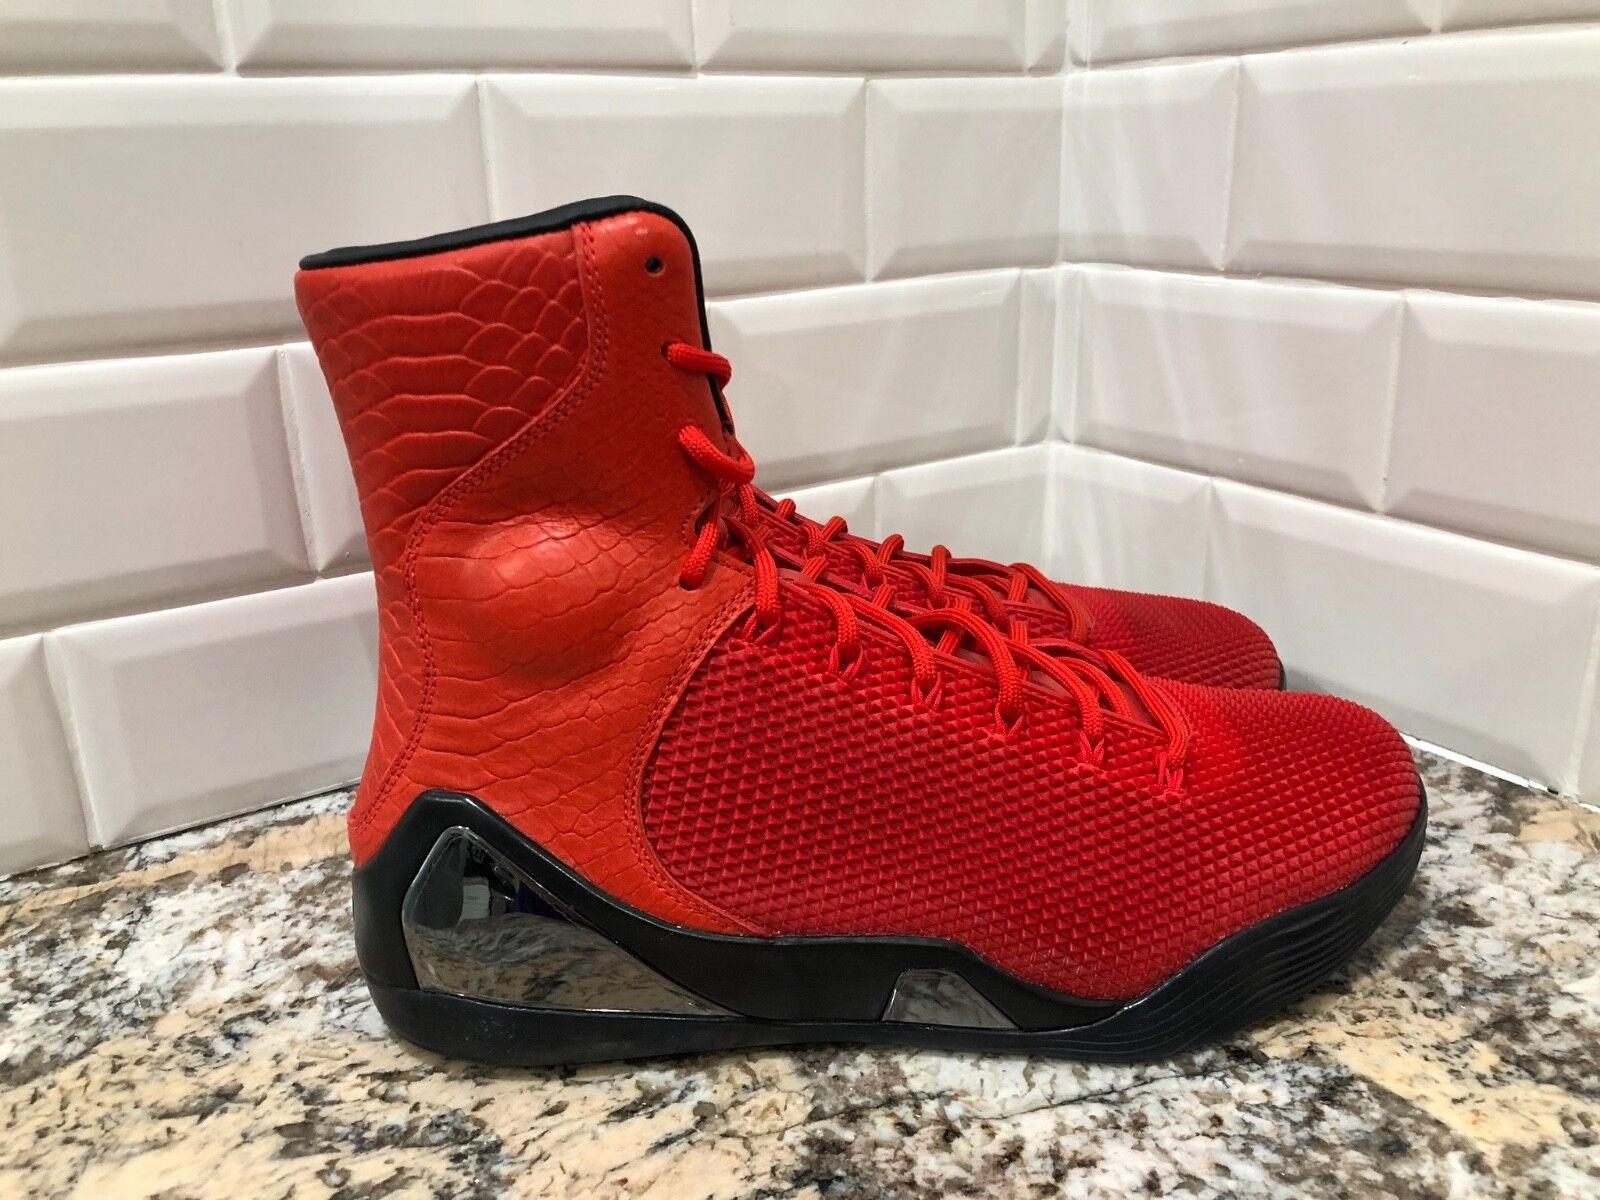 Nike kobe 9 ix alto krm ext qs sfida red mamba bryant 716993-600 sz - 9